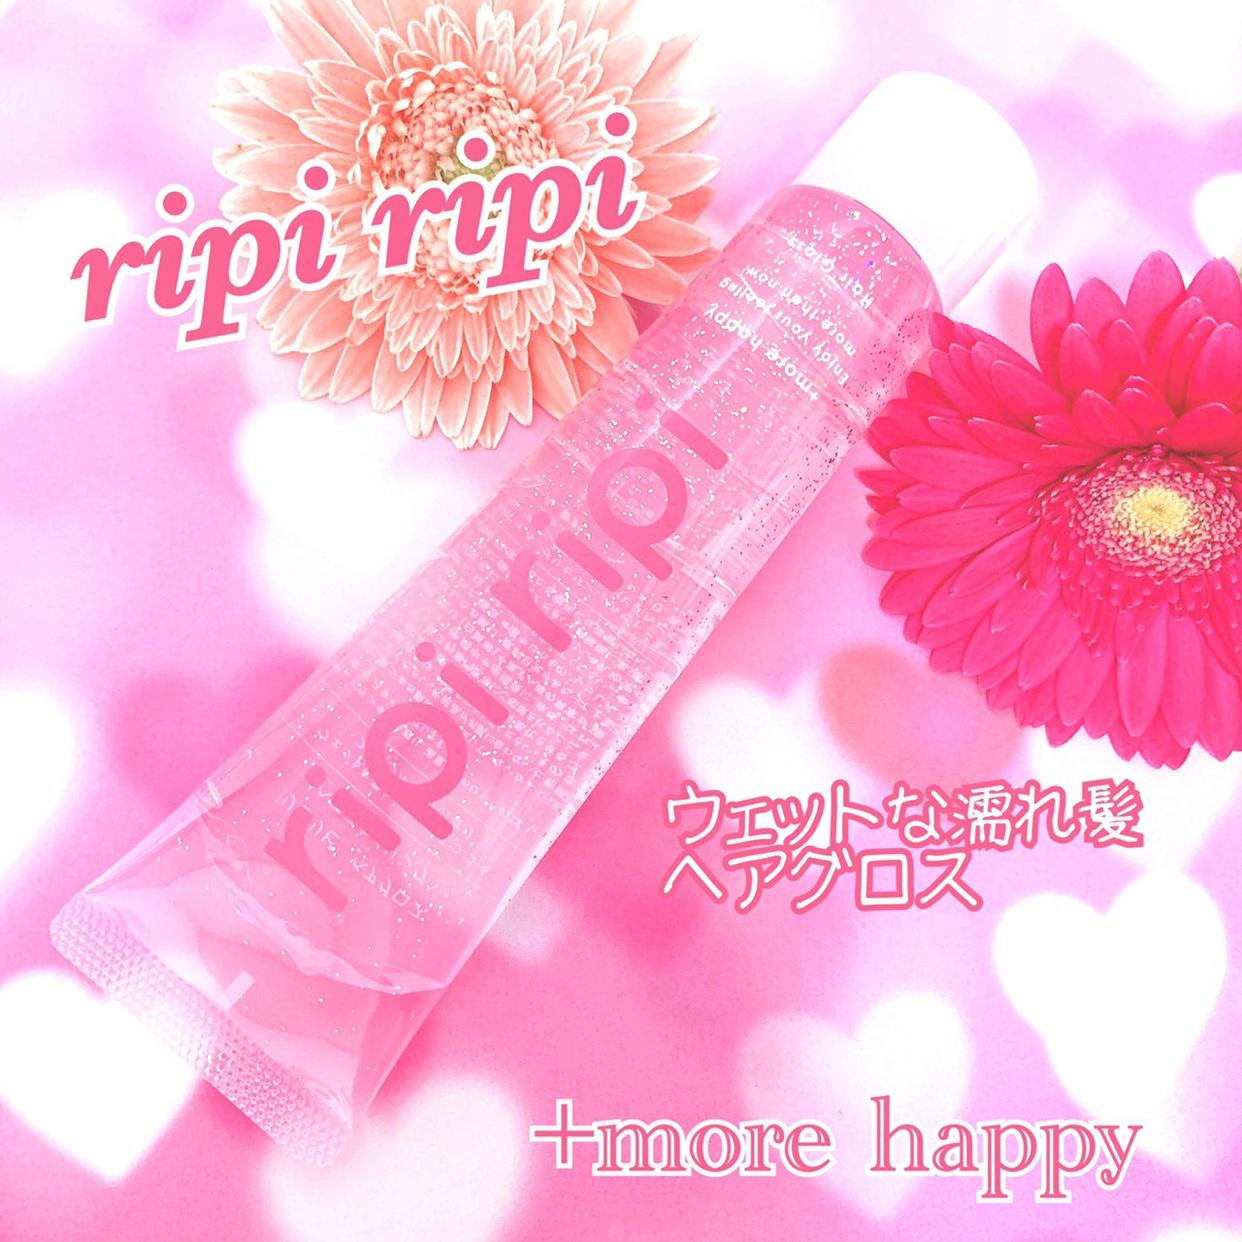 ripi ripi(リピリピ) ヘアグロスを使ったkana_cafe_timeさんのクチコミ画像1